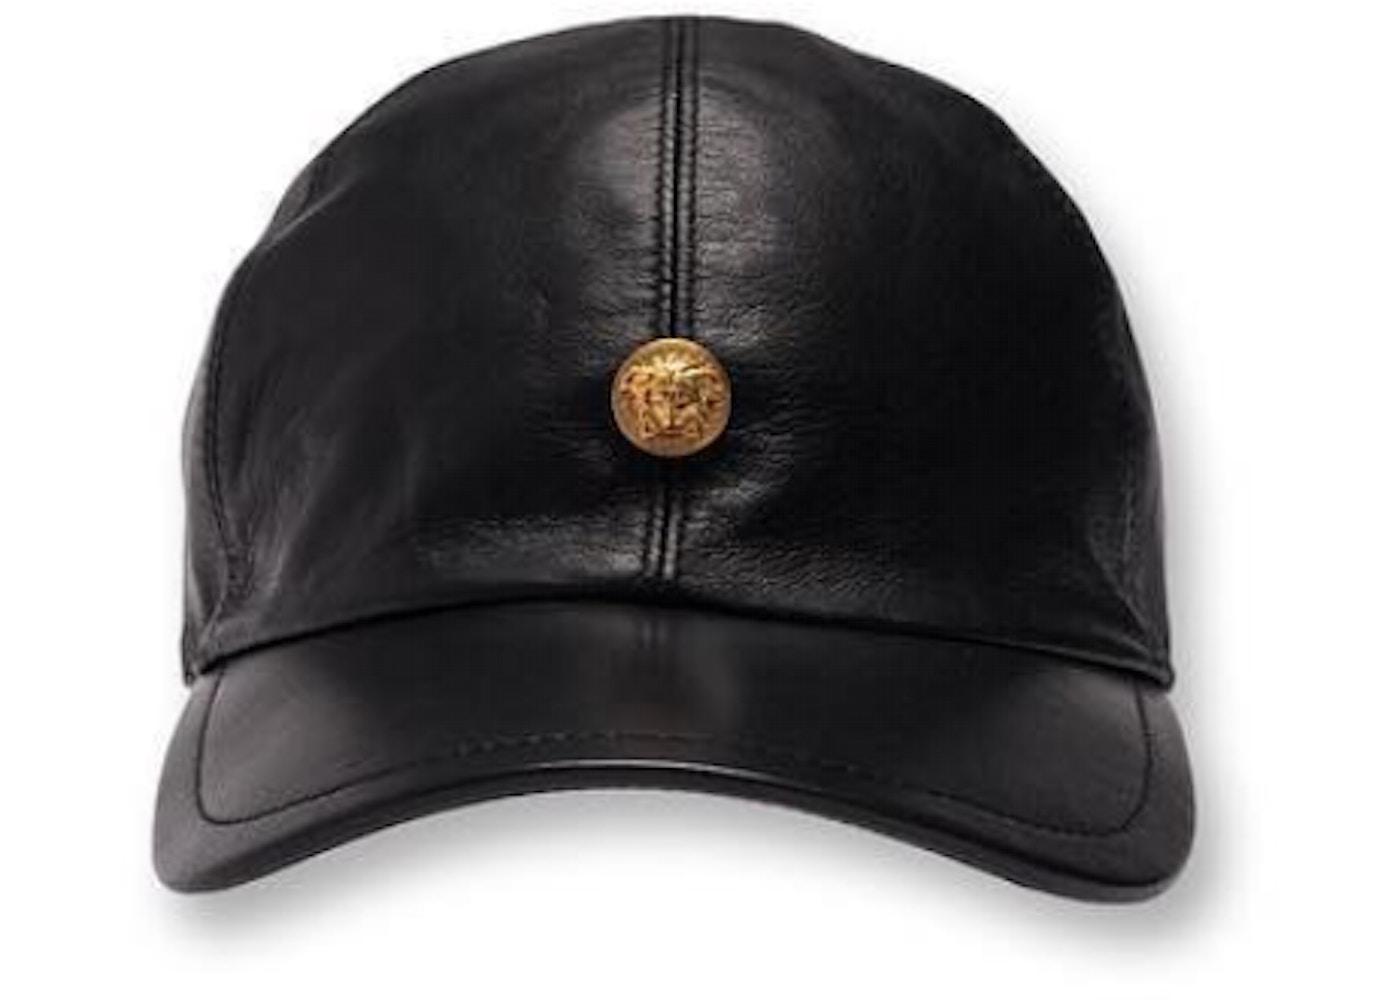 Kith x Versace Leather Cap Black - SS19 01b21b9c53b